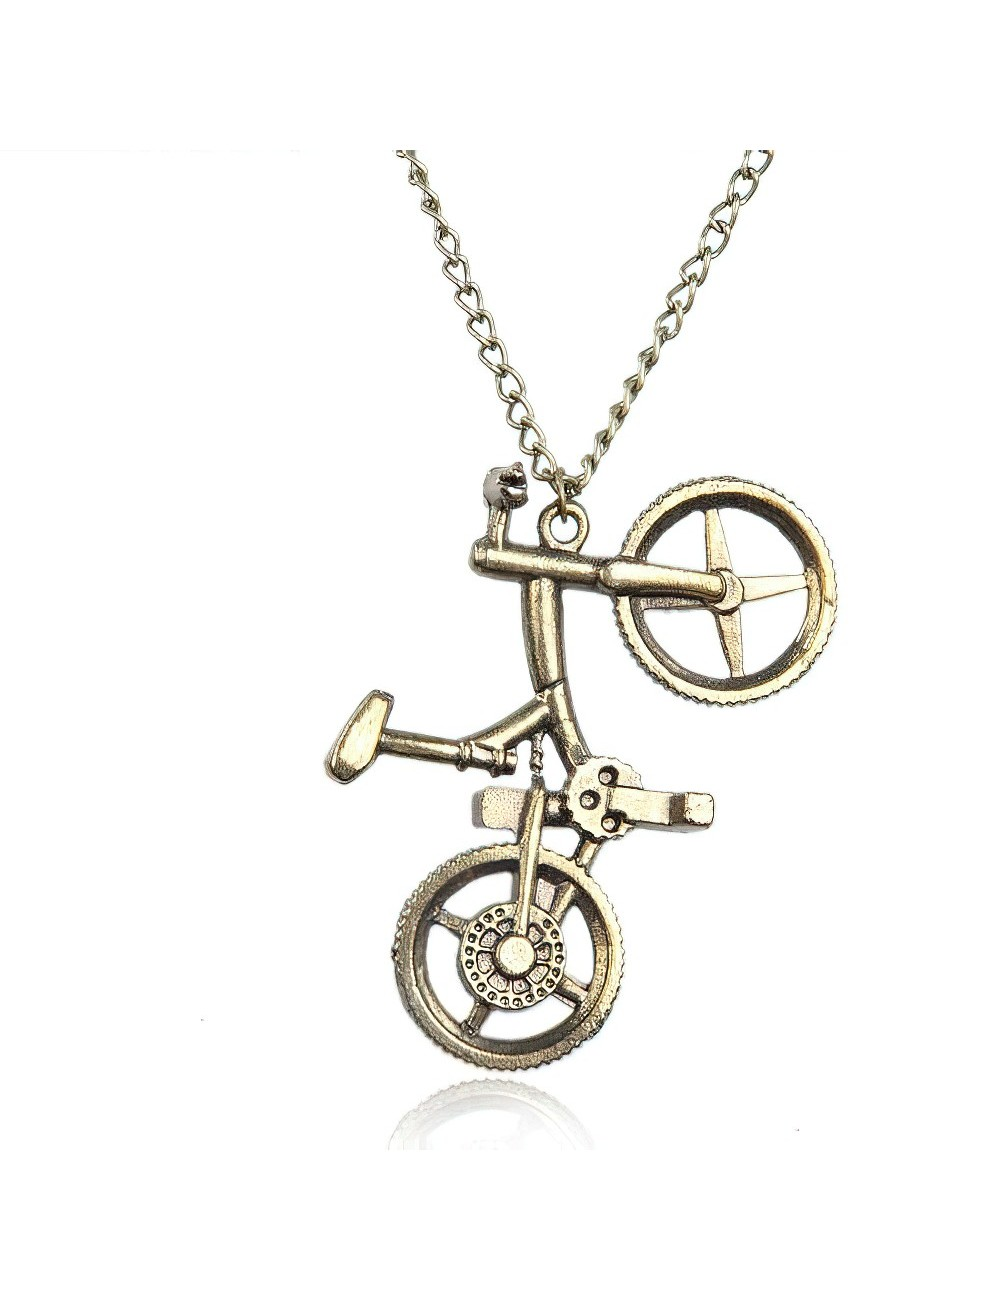 Collar Bicicleta Dayoshop 13,900.00